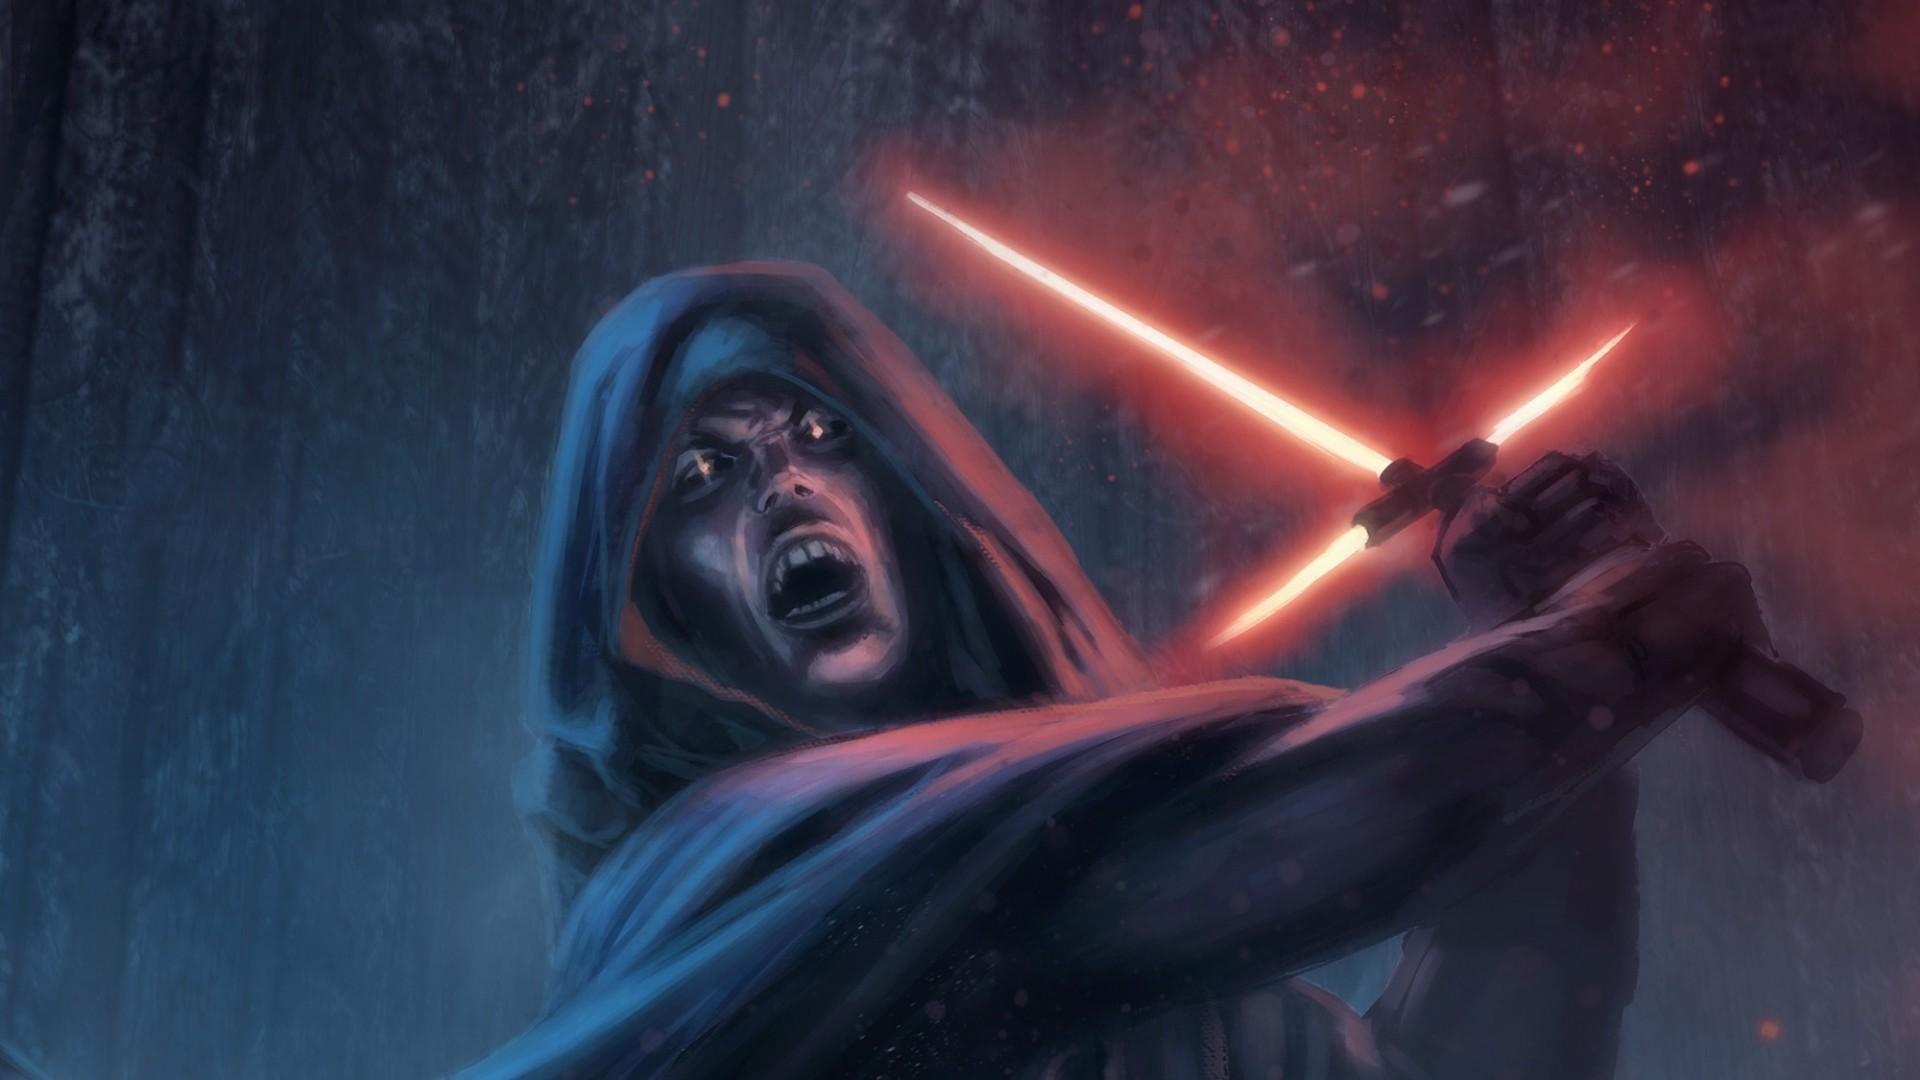 Star Wars Force Awakens 1080p: The Force Awakens 1080p Wallpaper (62+ Images